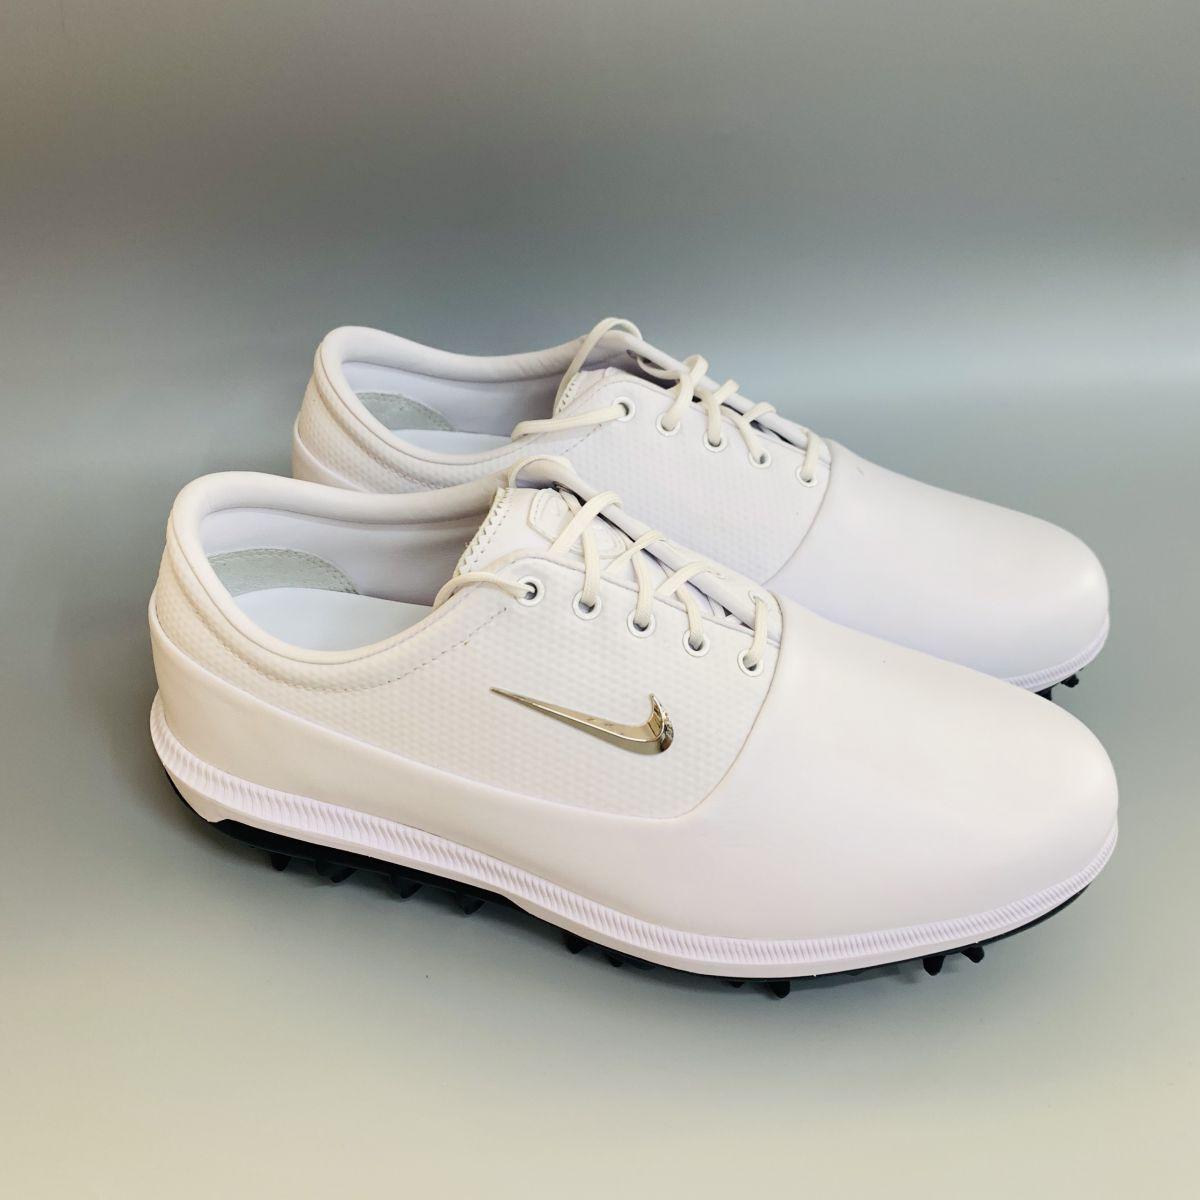 Giày chơi golf hiệu suất cao Nike Air Zoom Victory Tour (W)